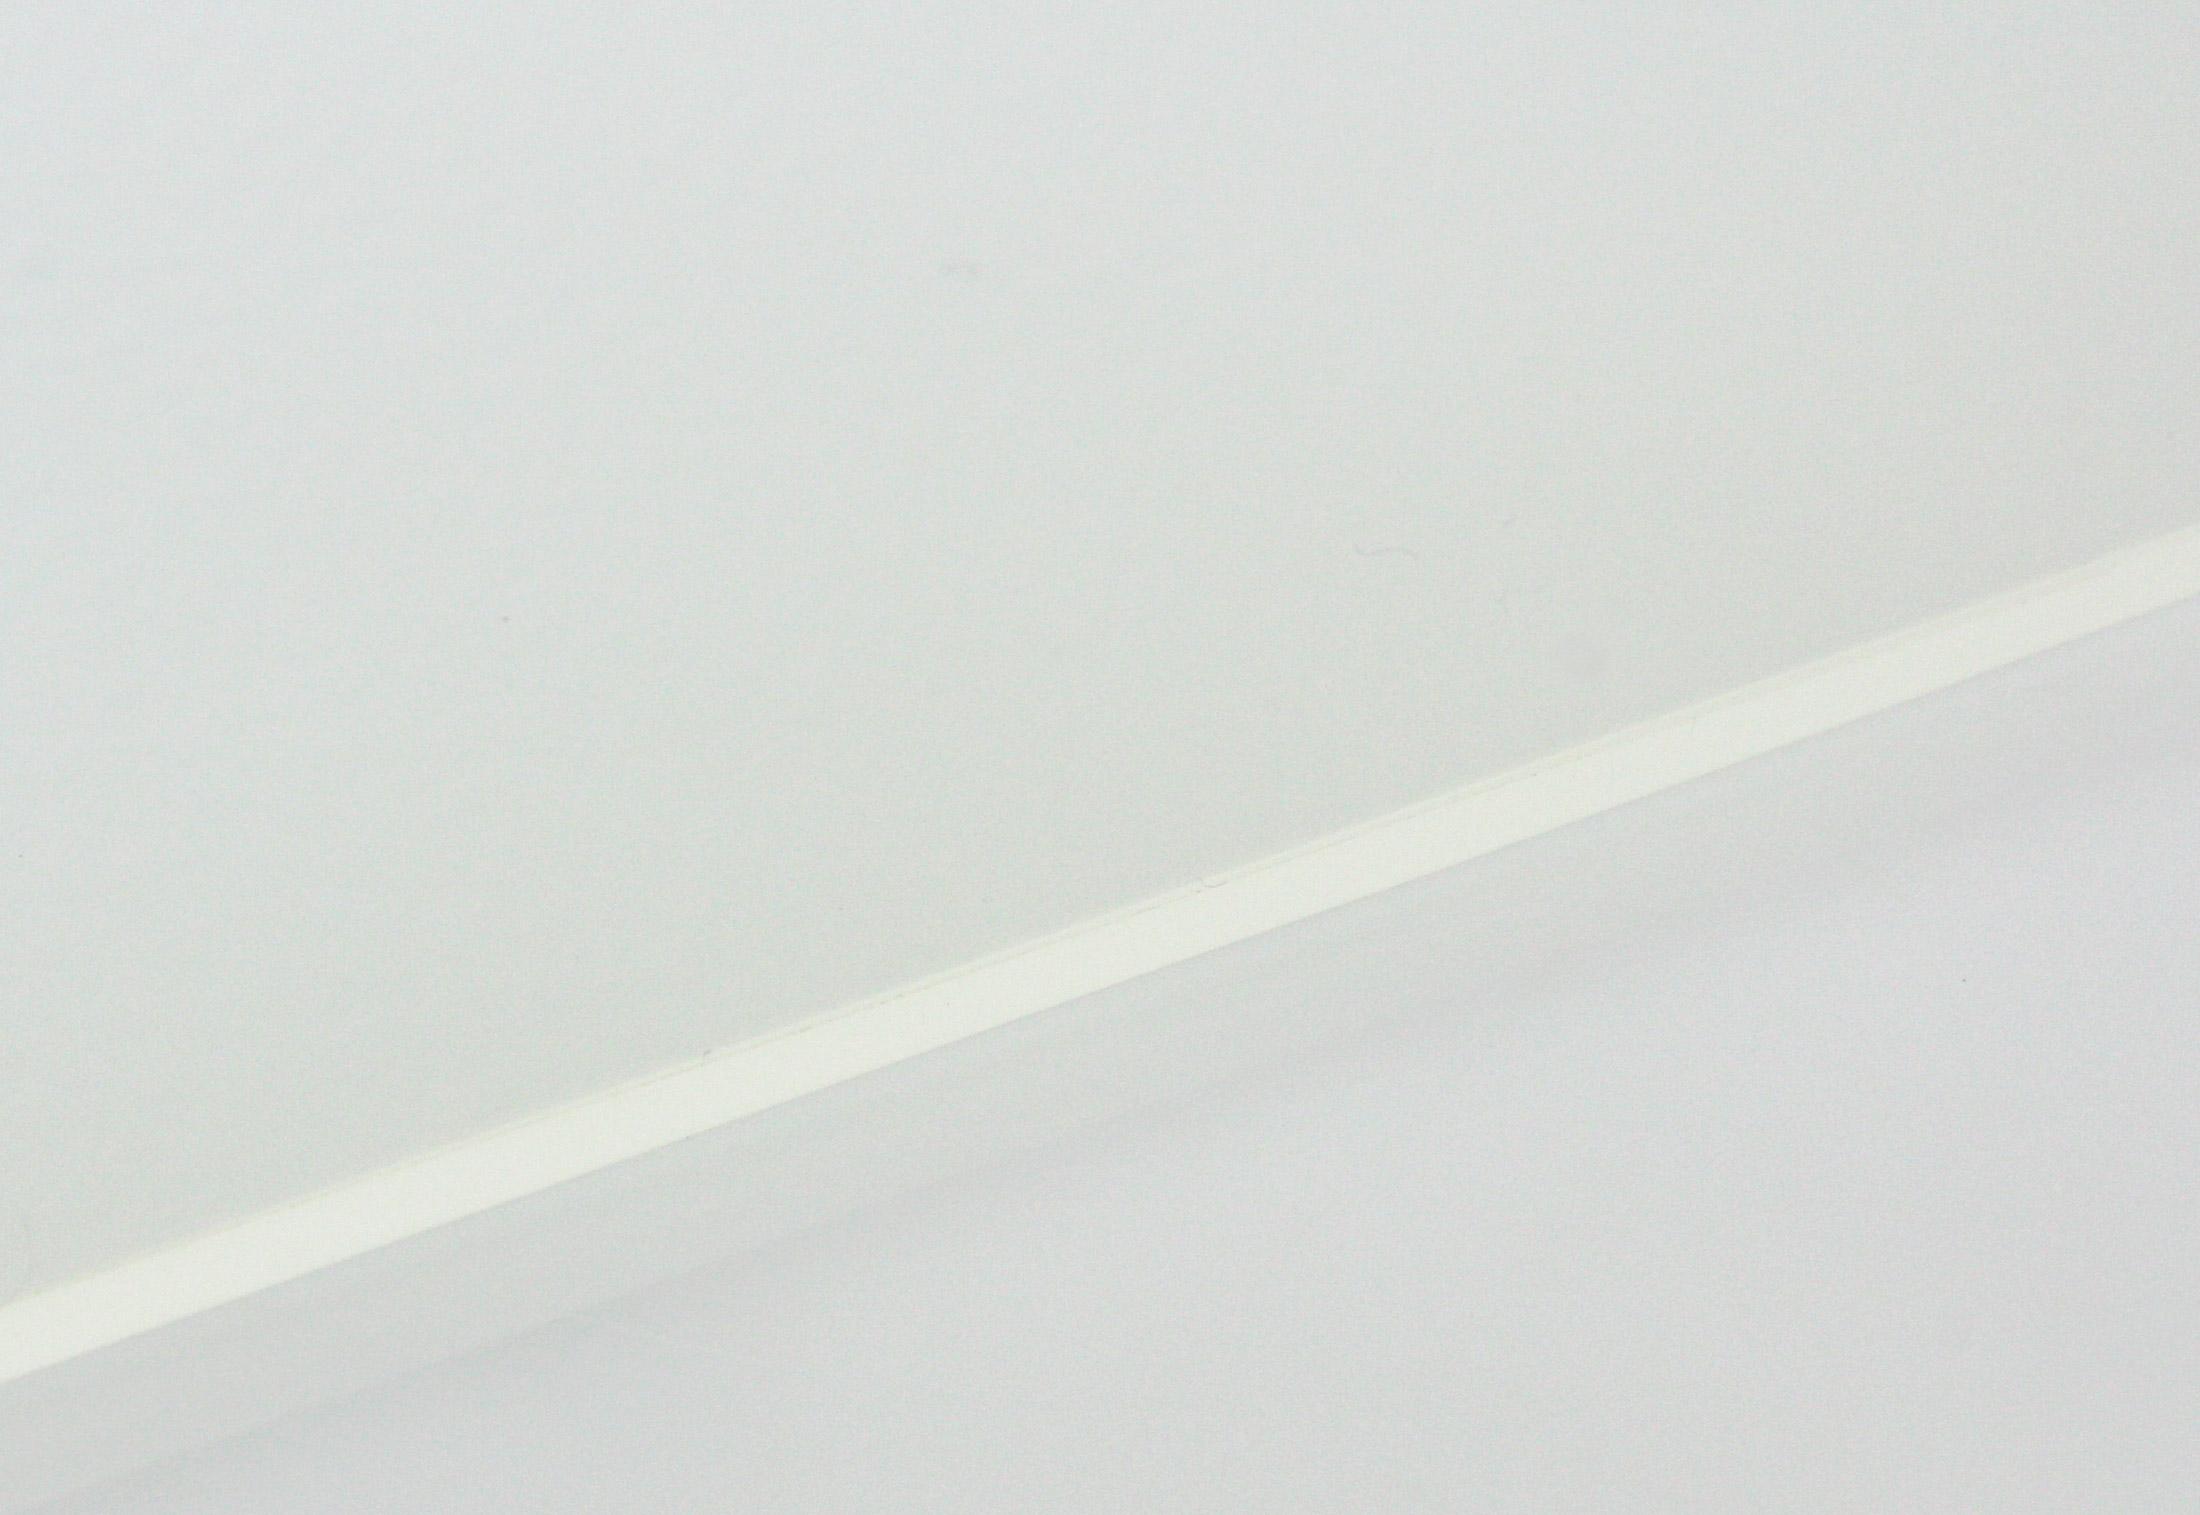 Technogel Transparent By Technogel